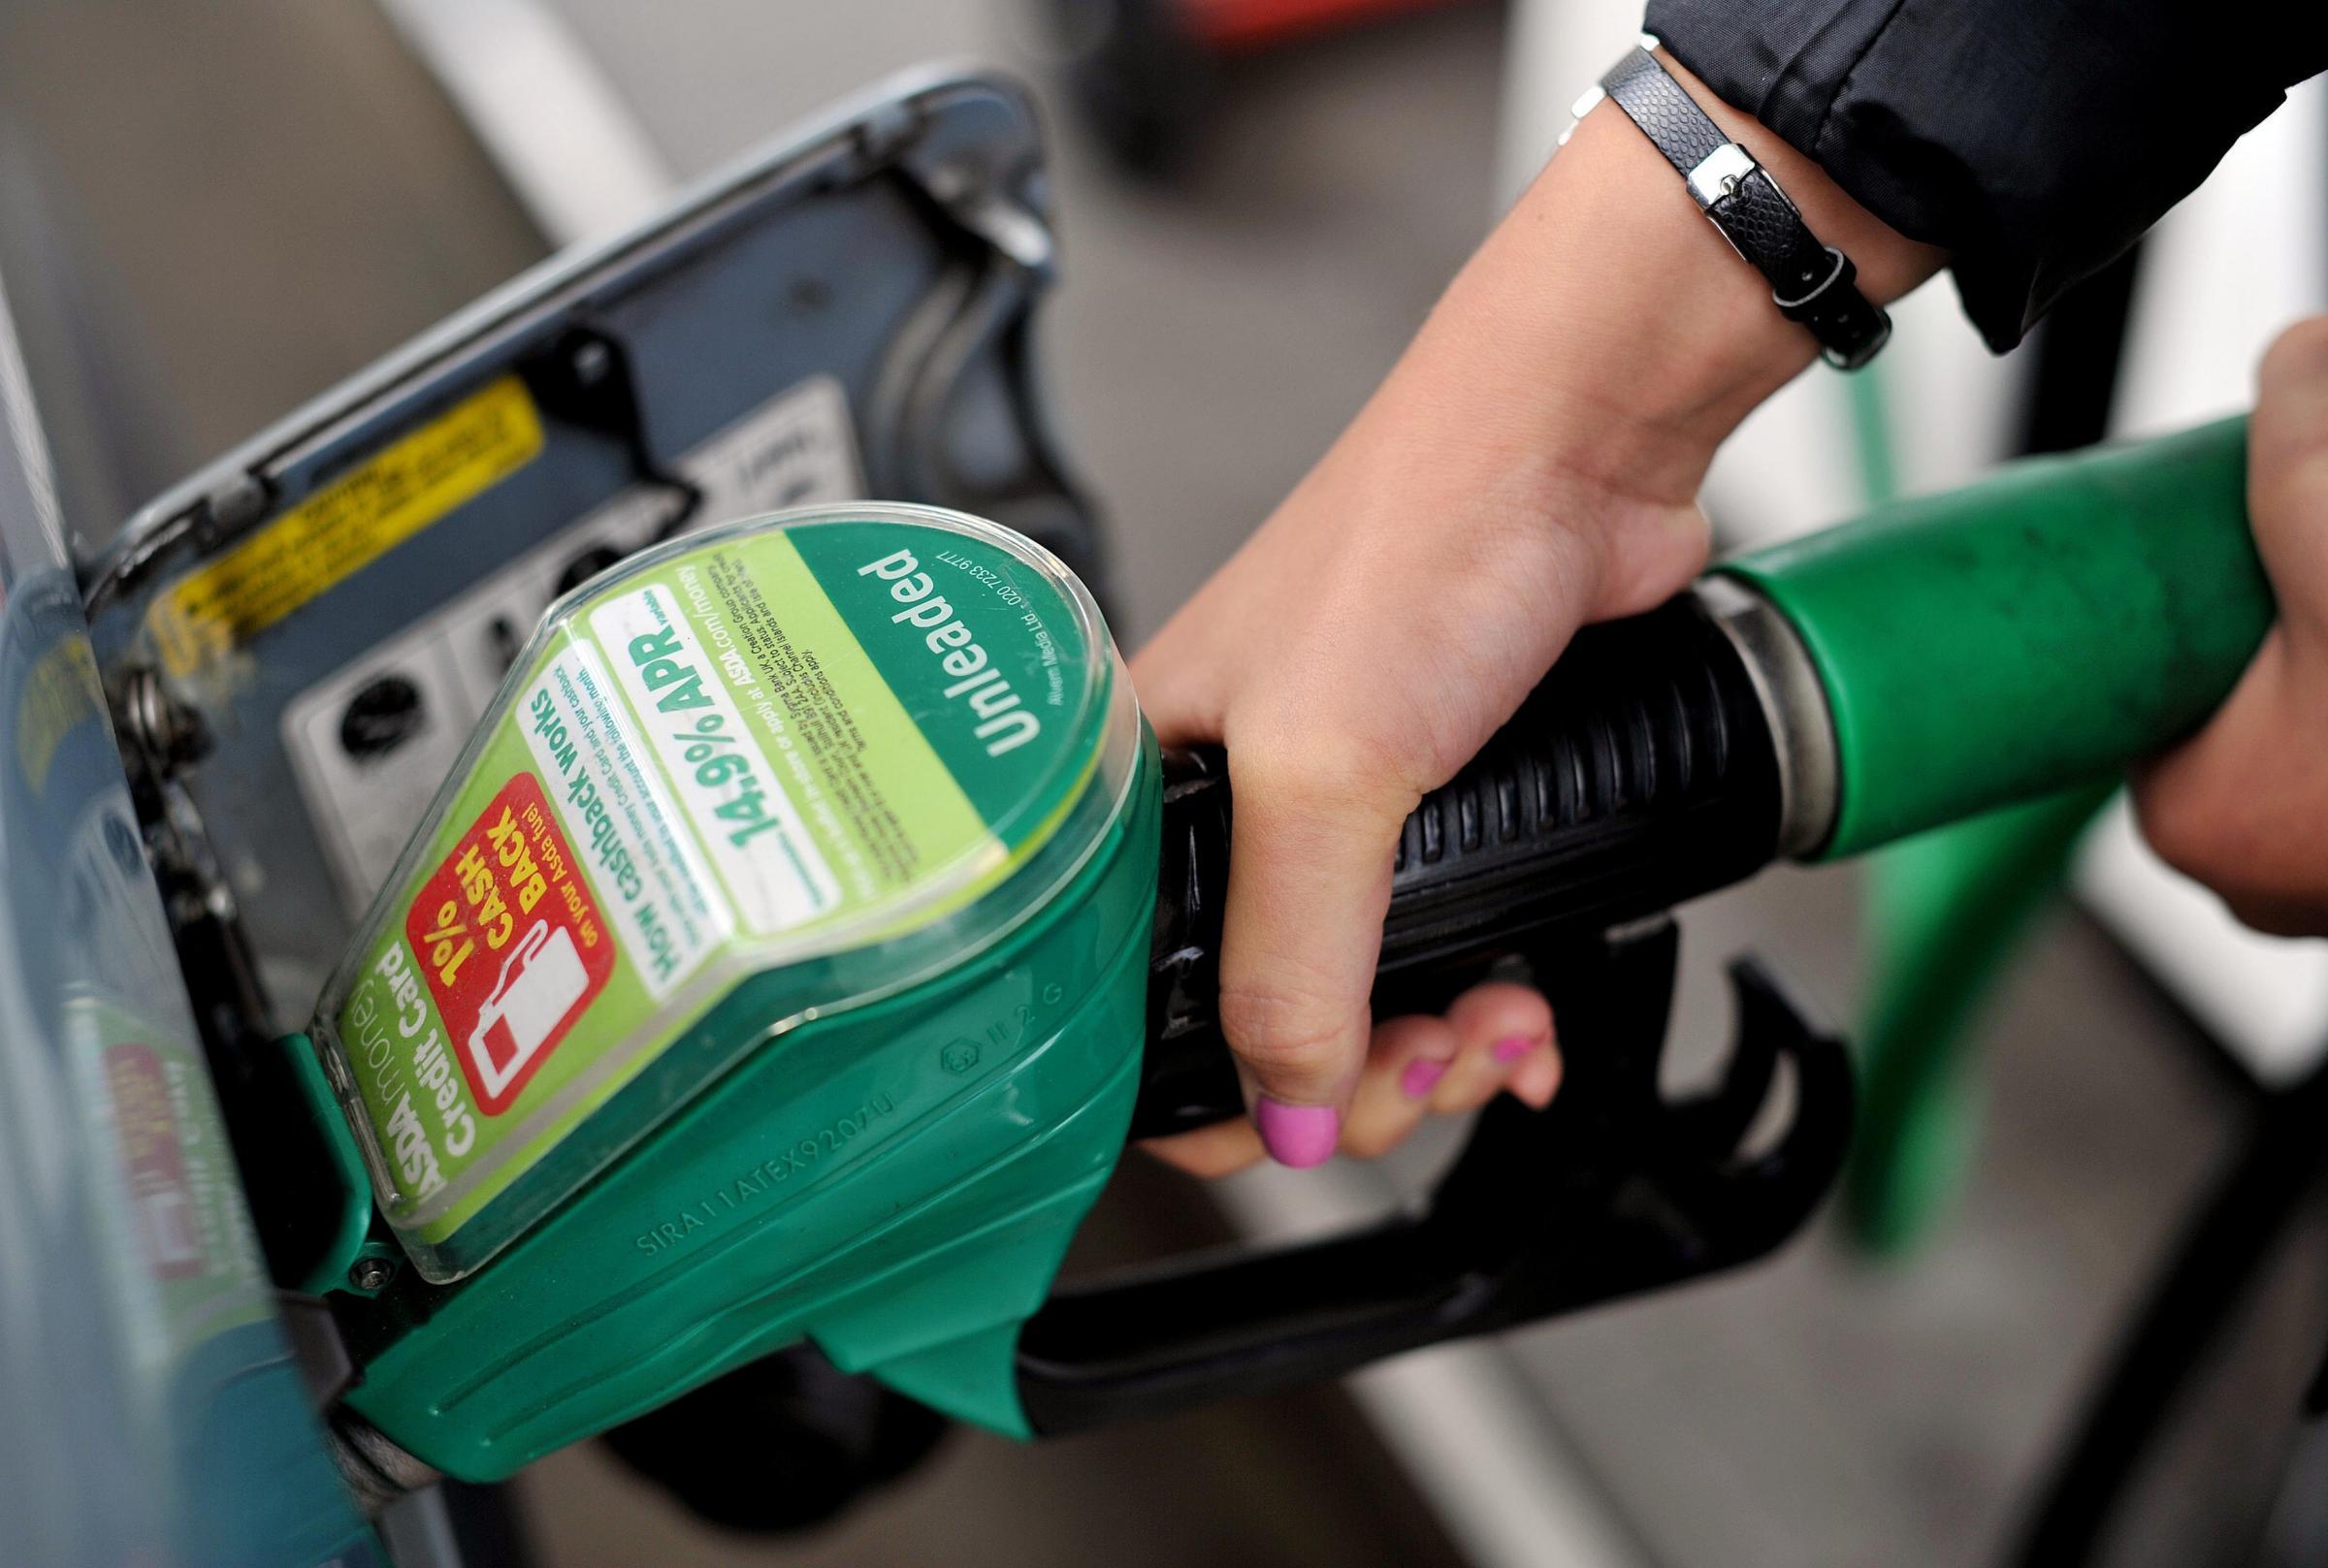 Supermarkets cut petrol prices by 3p per litre